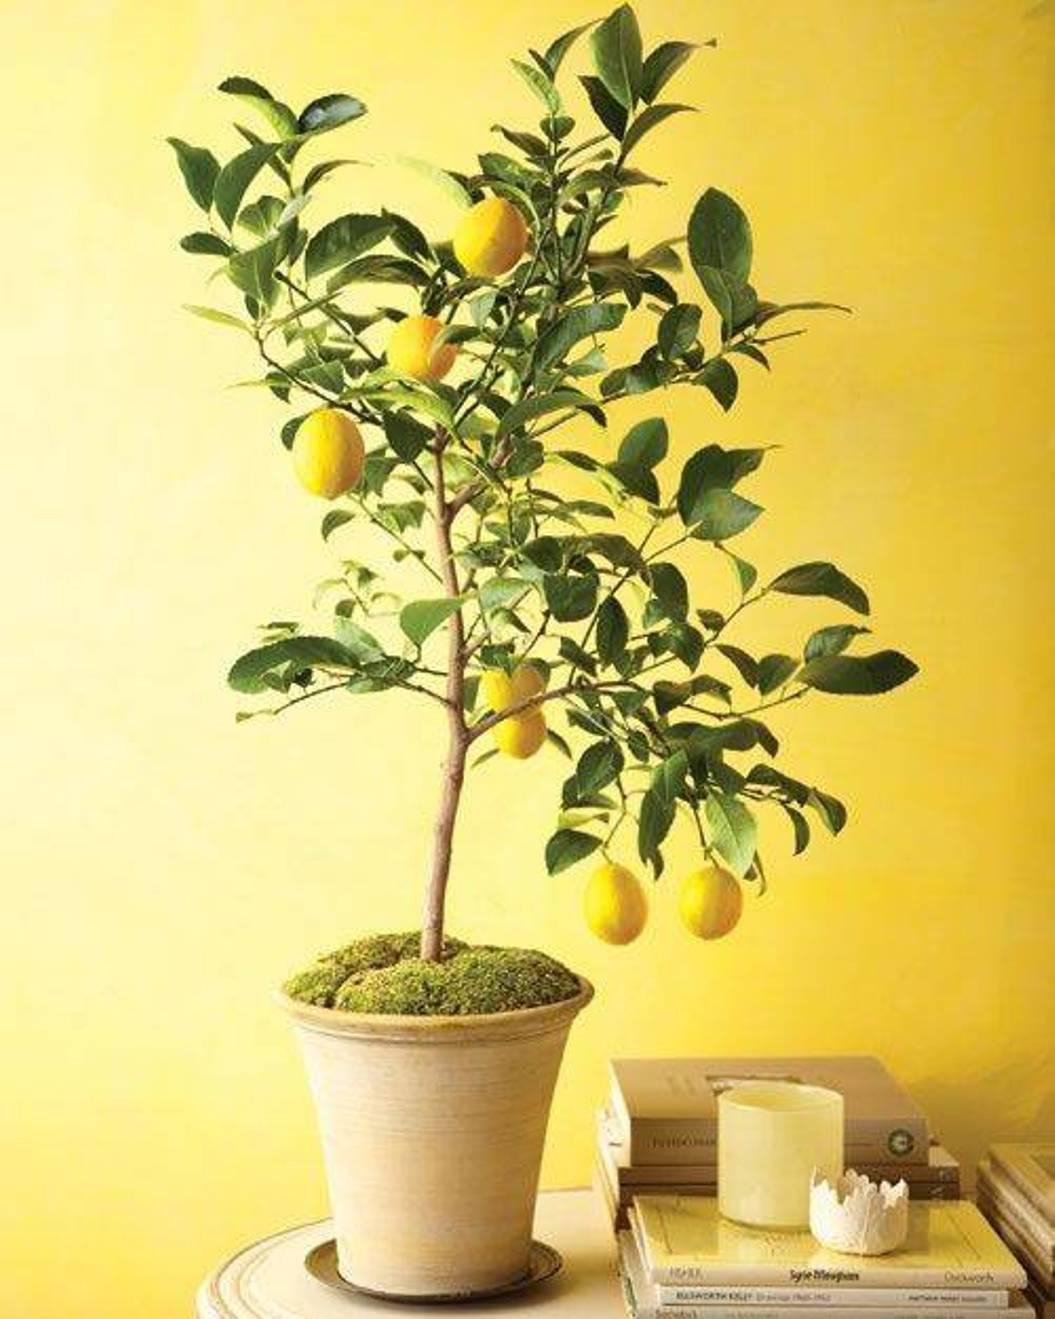 Лимон уход в домашних условиях. Особенности размножения